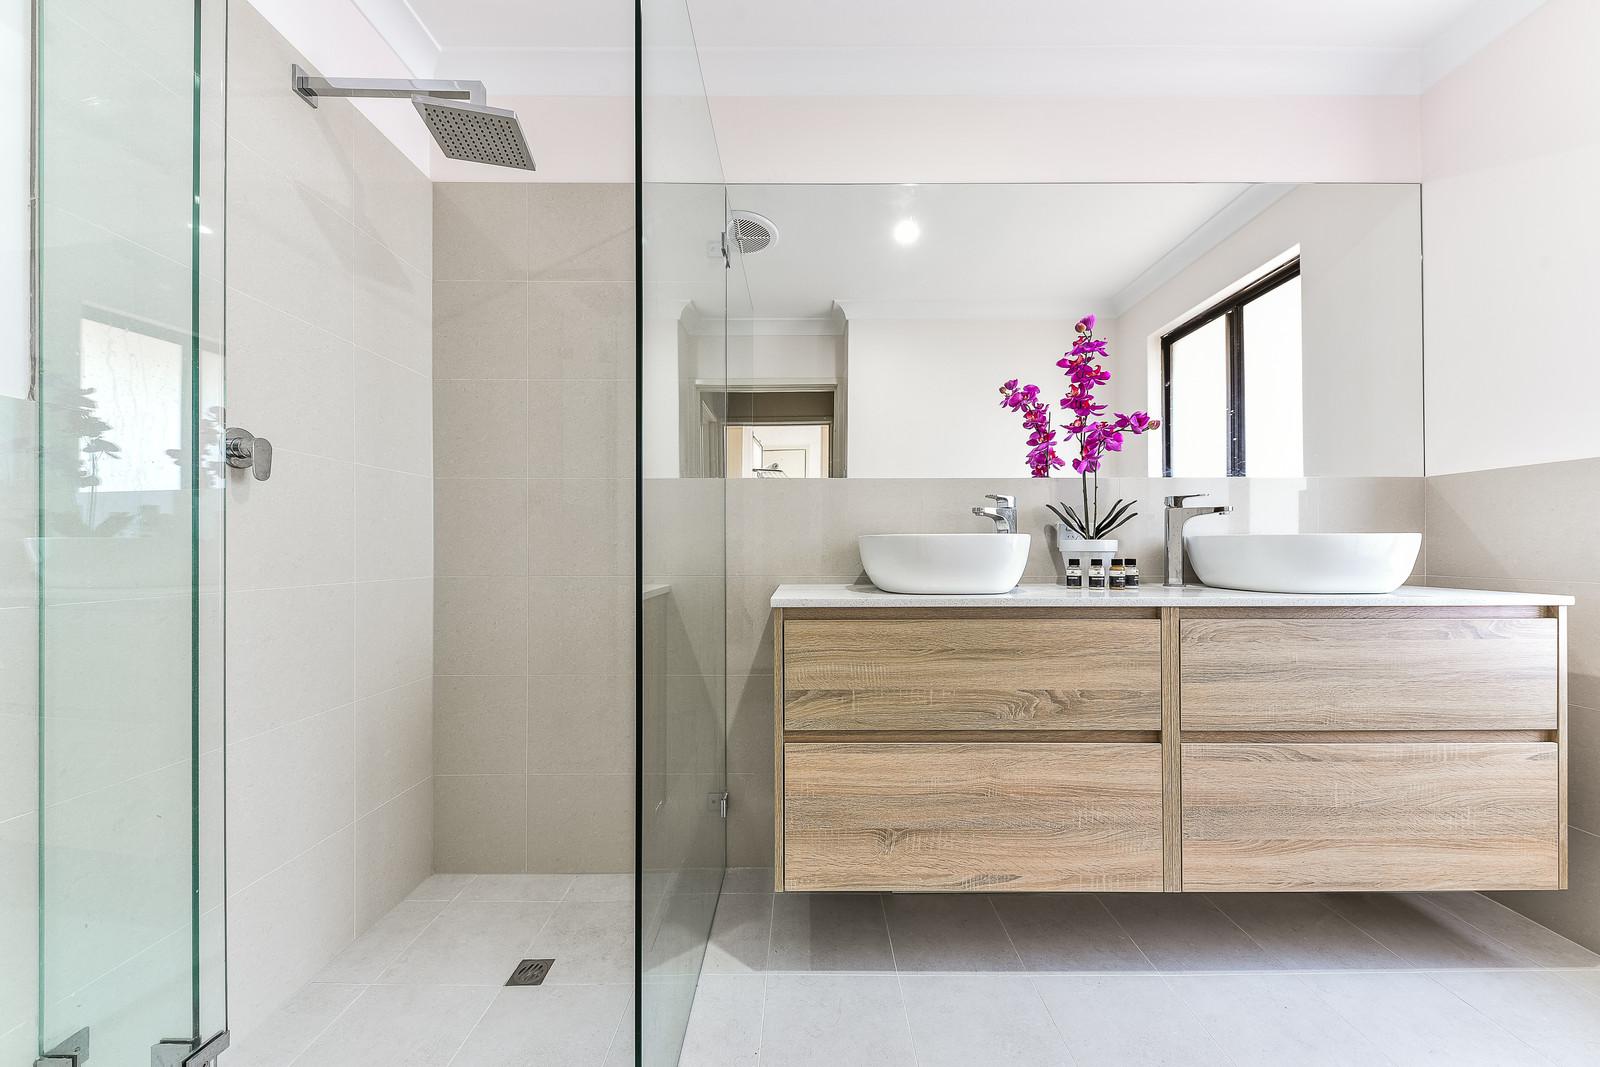 Bathroom Renovations Perth Western Australia   Bathroom ideas WA ...